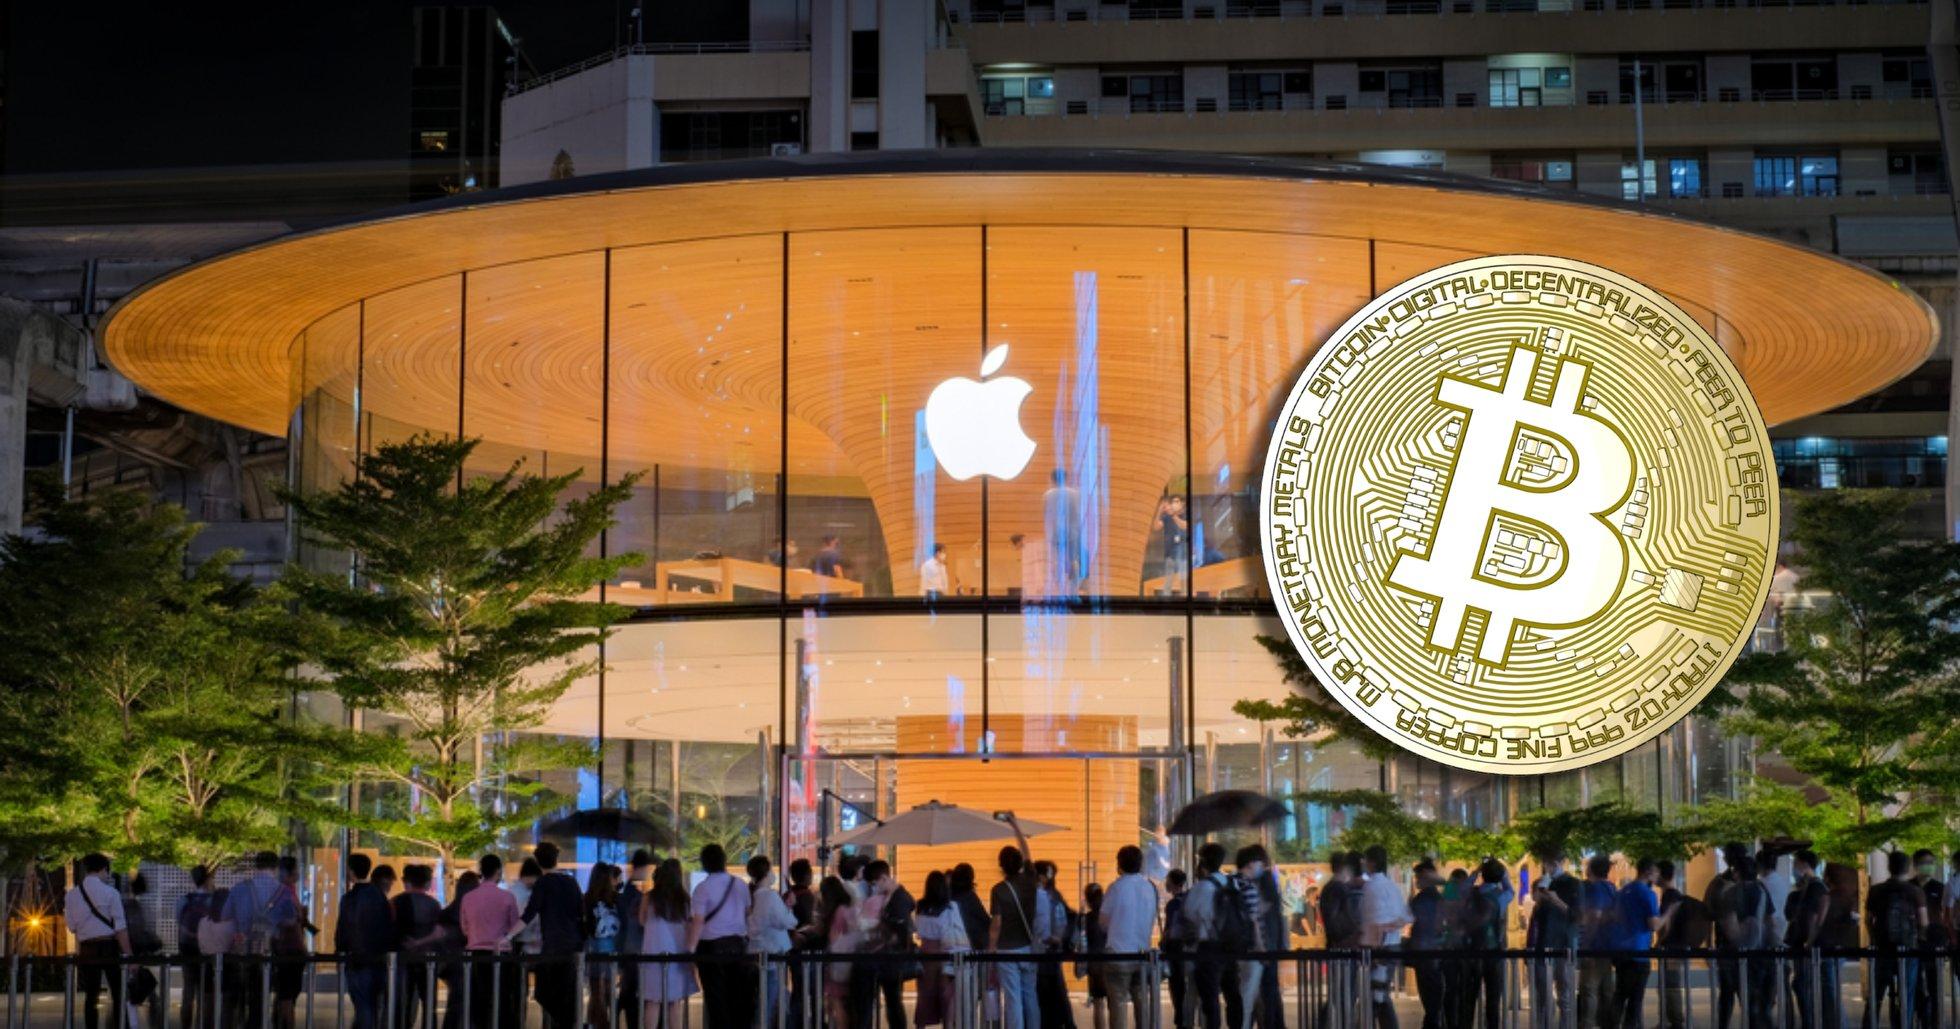 Apple söker person med erfarenhet av kryptovalutor i ny jobbannons